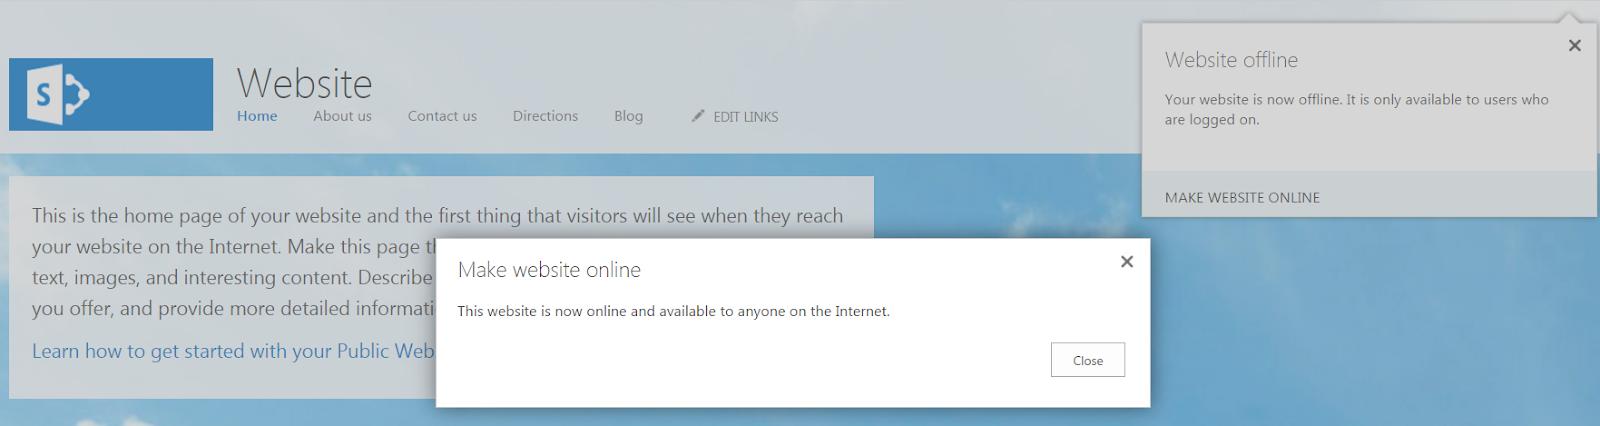 Make Public Website Online